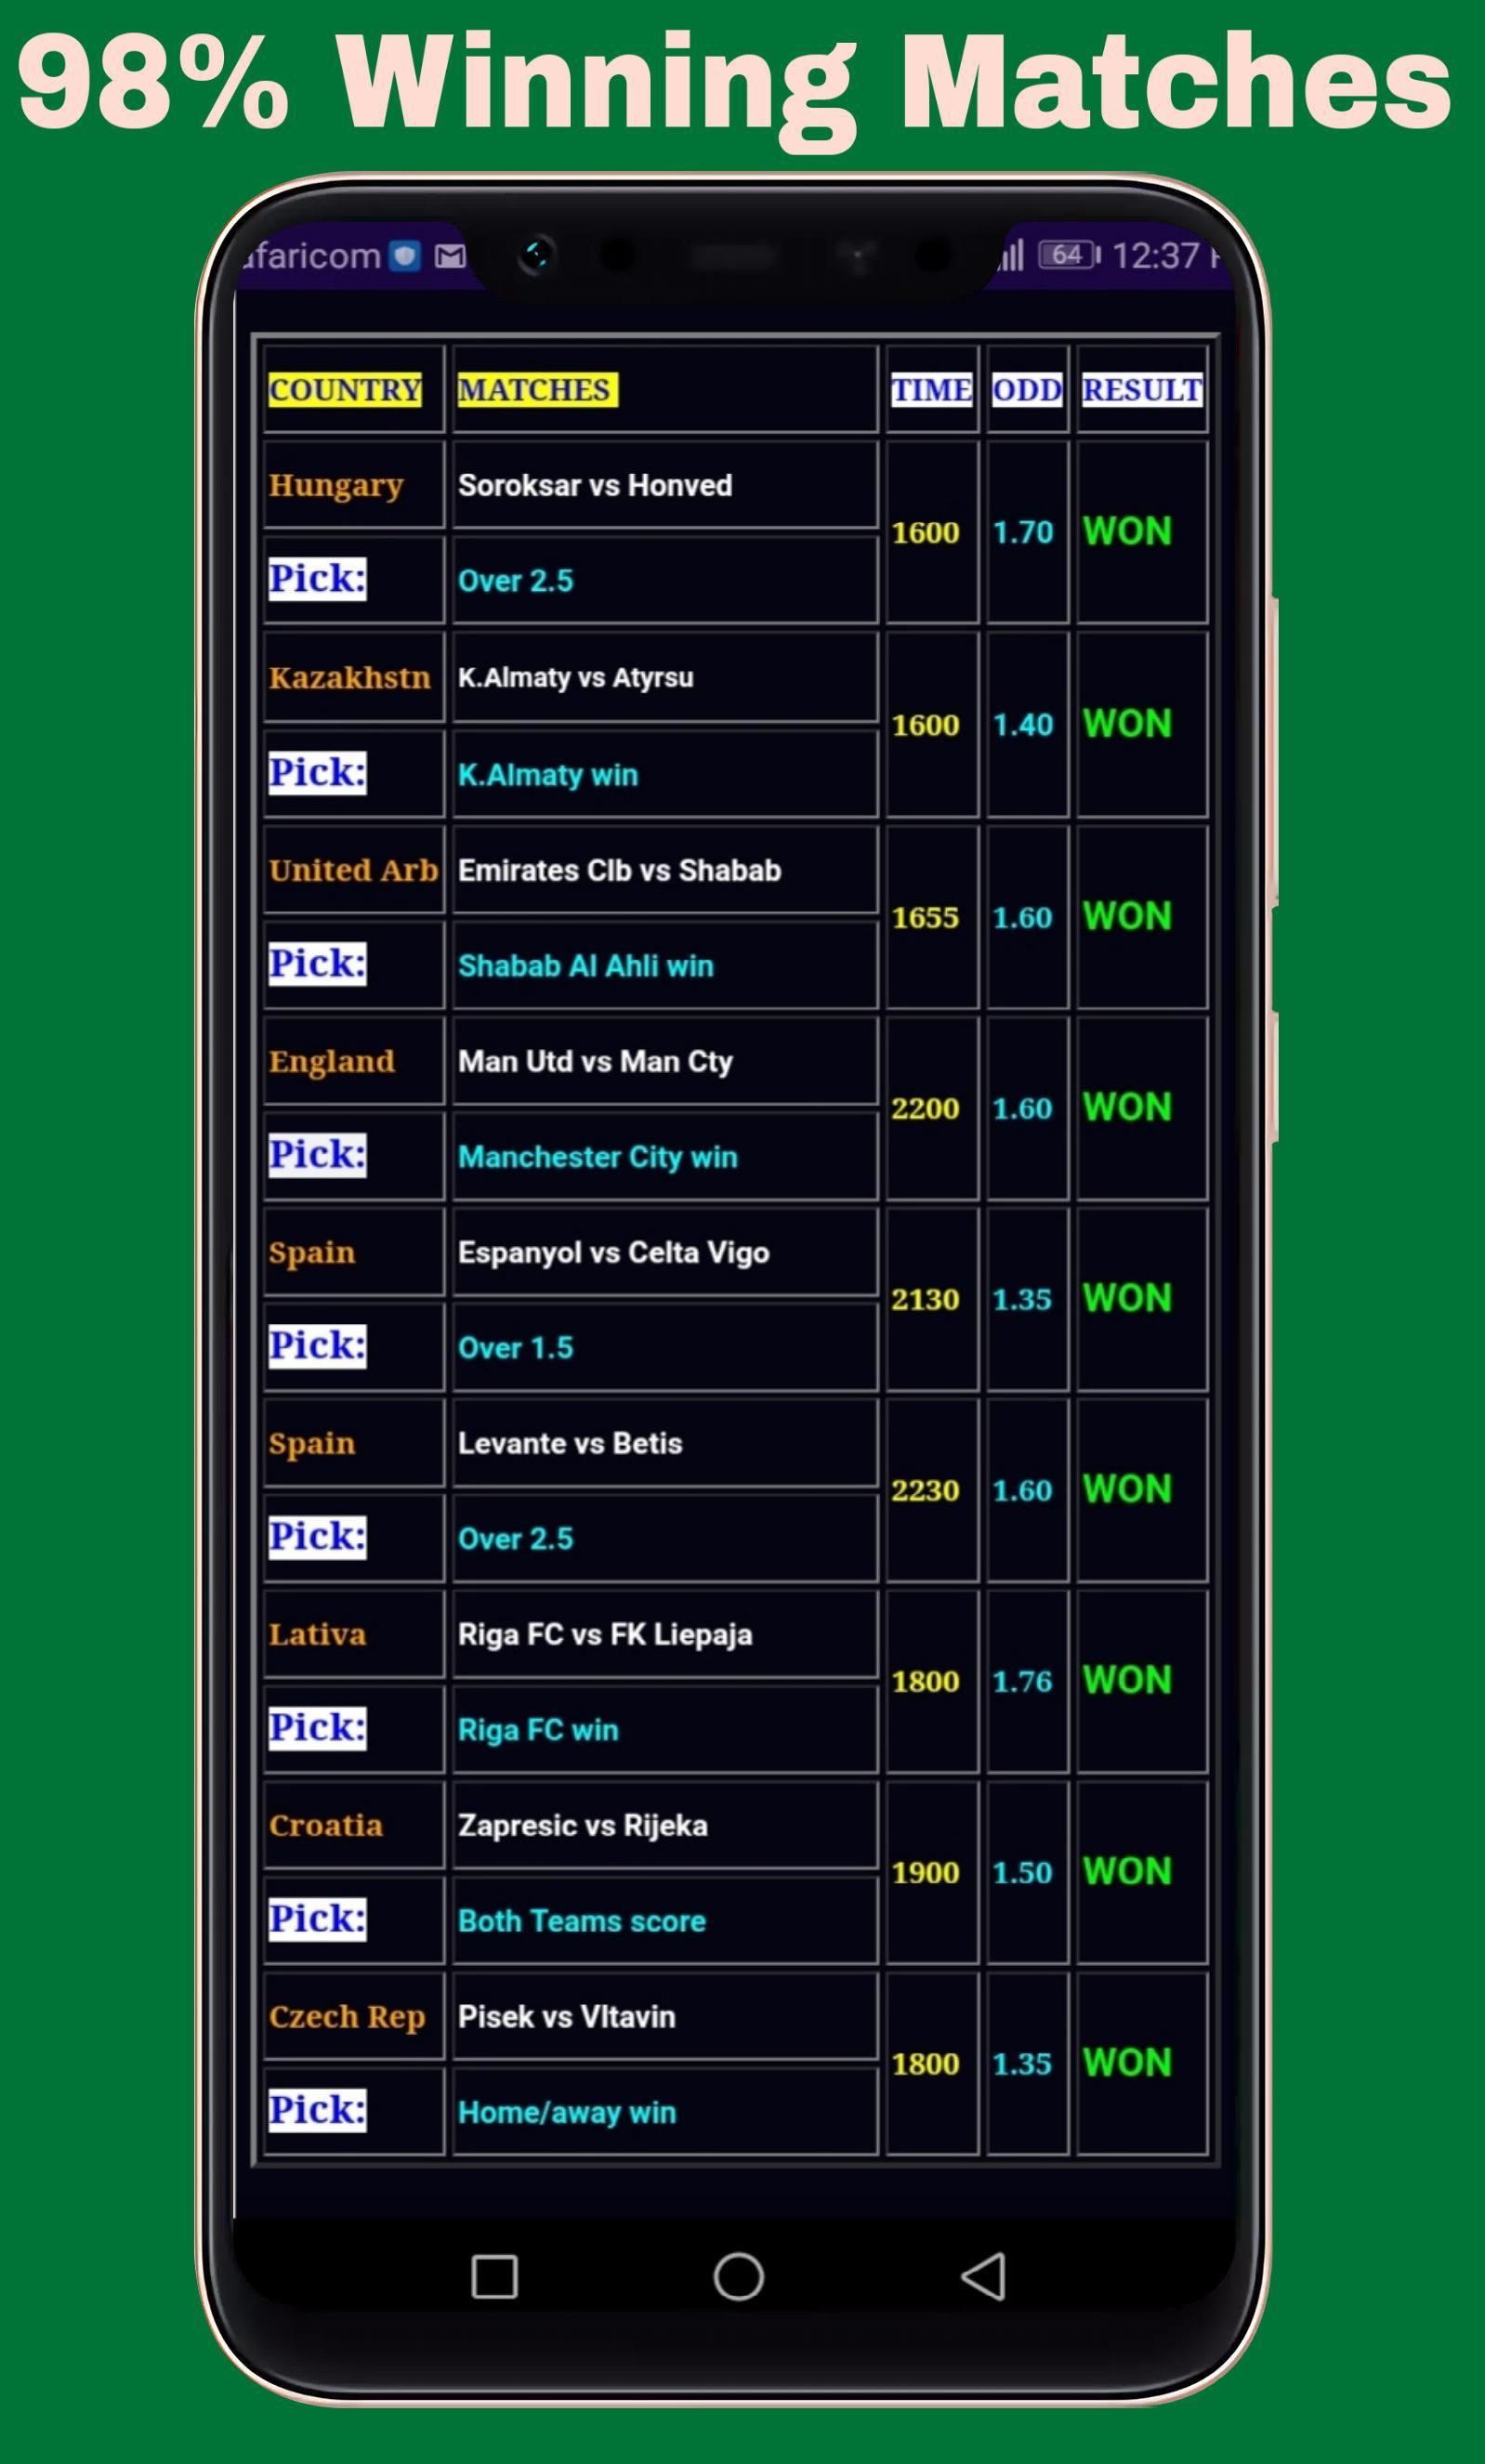 everyday 1 betting tip apk